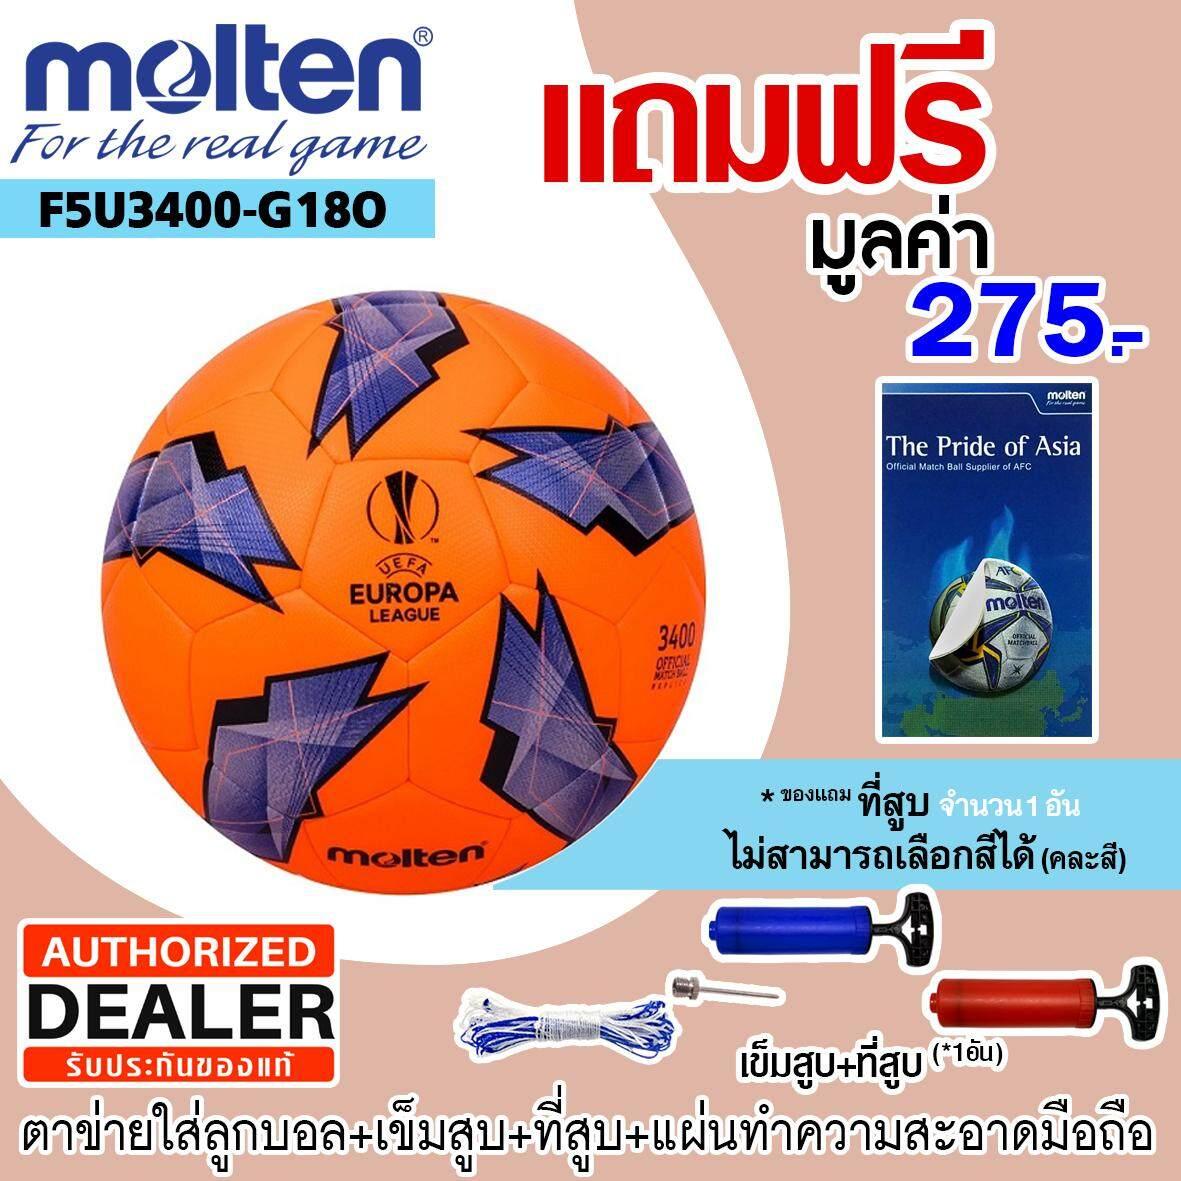 Molten ฟุตบอล หนังเย็บ ยูโรปา ลีก Football Hybrid PU pk F5U3400-G18 UEL(990) แถมฟรี ตาข่ายใส่ลูกฟุตบอล + เข็มสูบลม + สูบมือ SPL รุ่น SL6 สีชมพู + แผ่นทำความสะอาดมือถือ